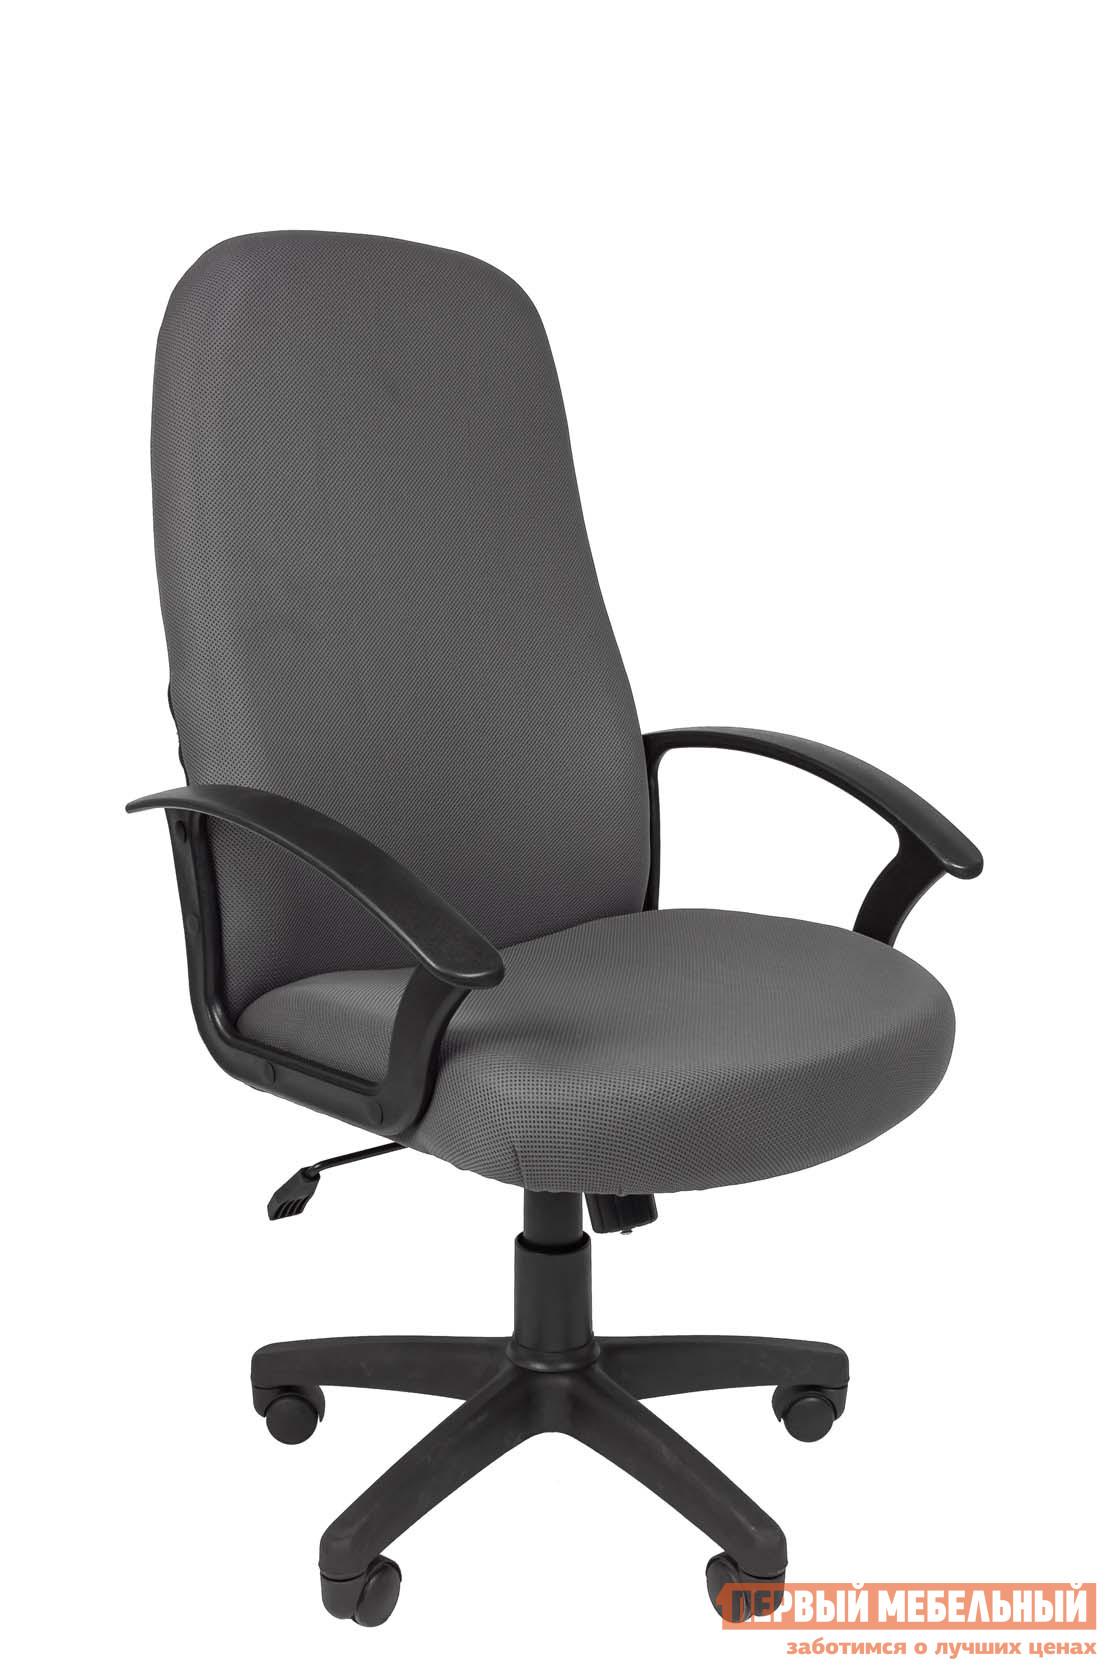 Офисное кресло  РК 189 TW / РК 189 SY Серый TW